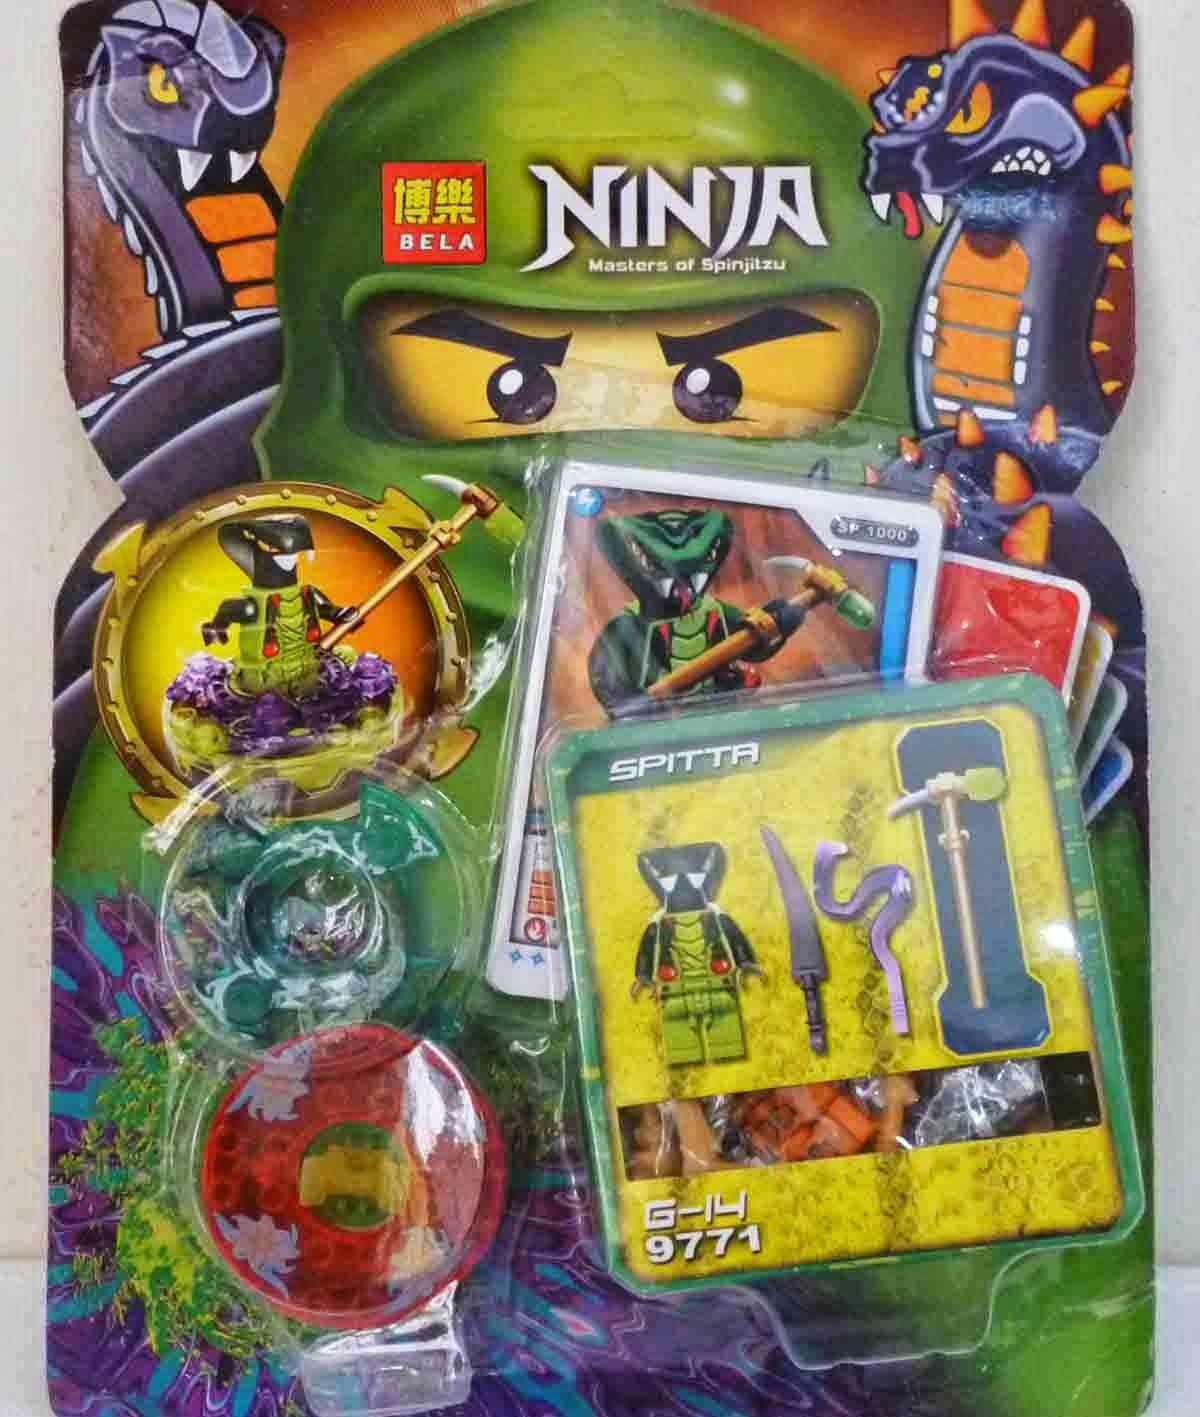 Toko Mainan Online Jual Anak Grosir Murah Ninjago Spitta 9771